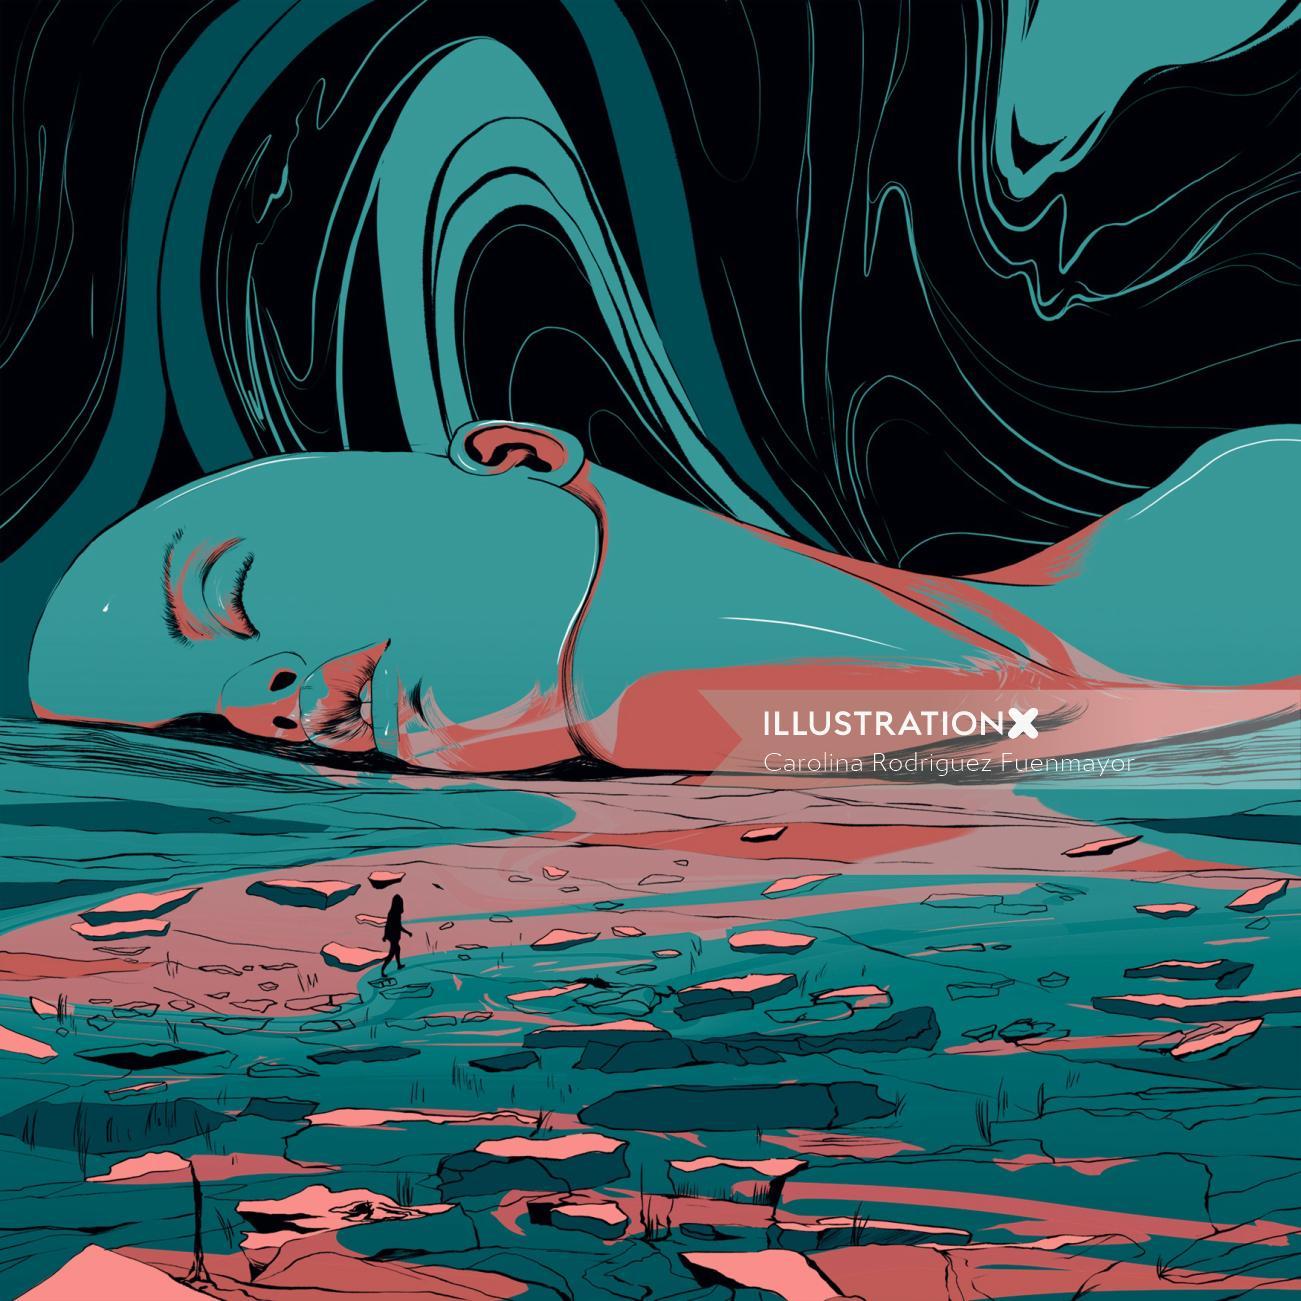 View Carolina Rodriguez Fuenmayor's illustration portfolio